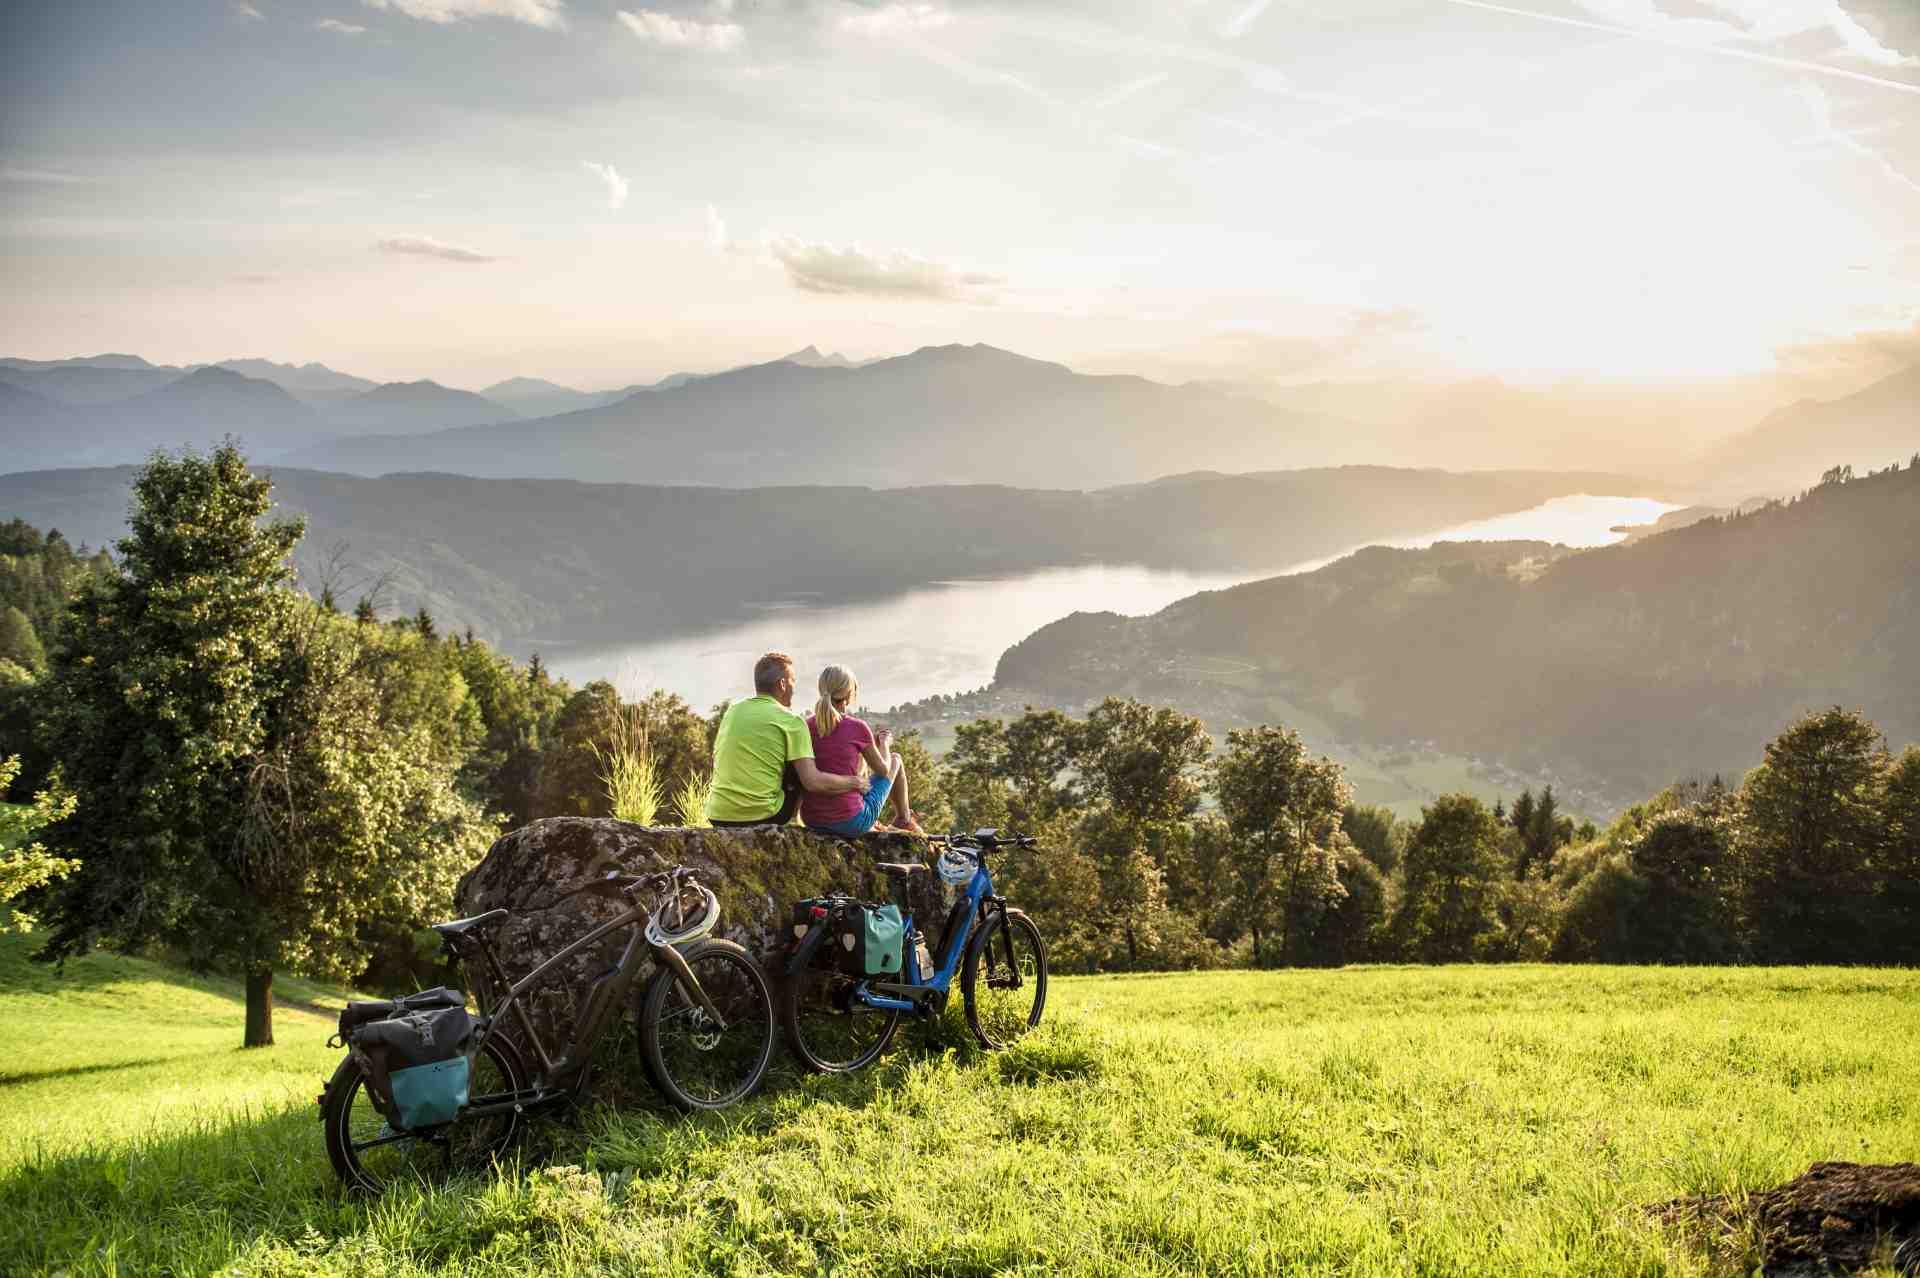 Fahrradfahrer blicken auf den Millstätter See bei Sonnenuntergang